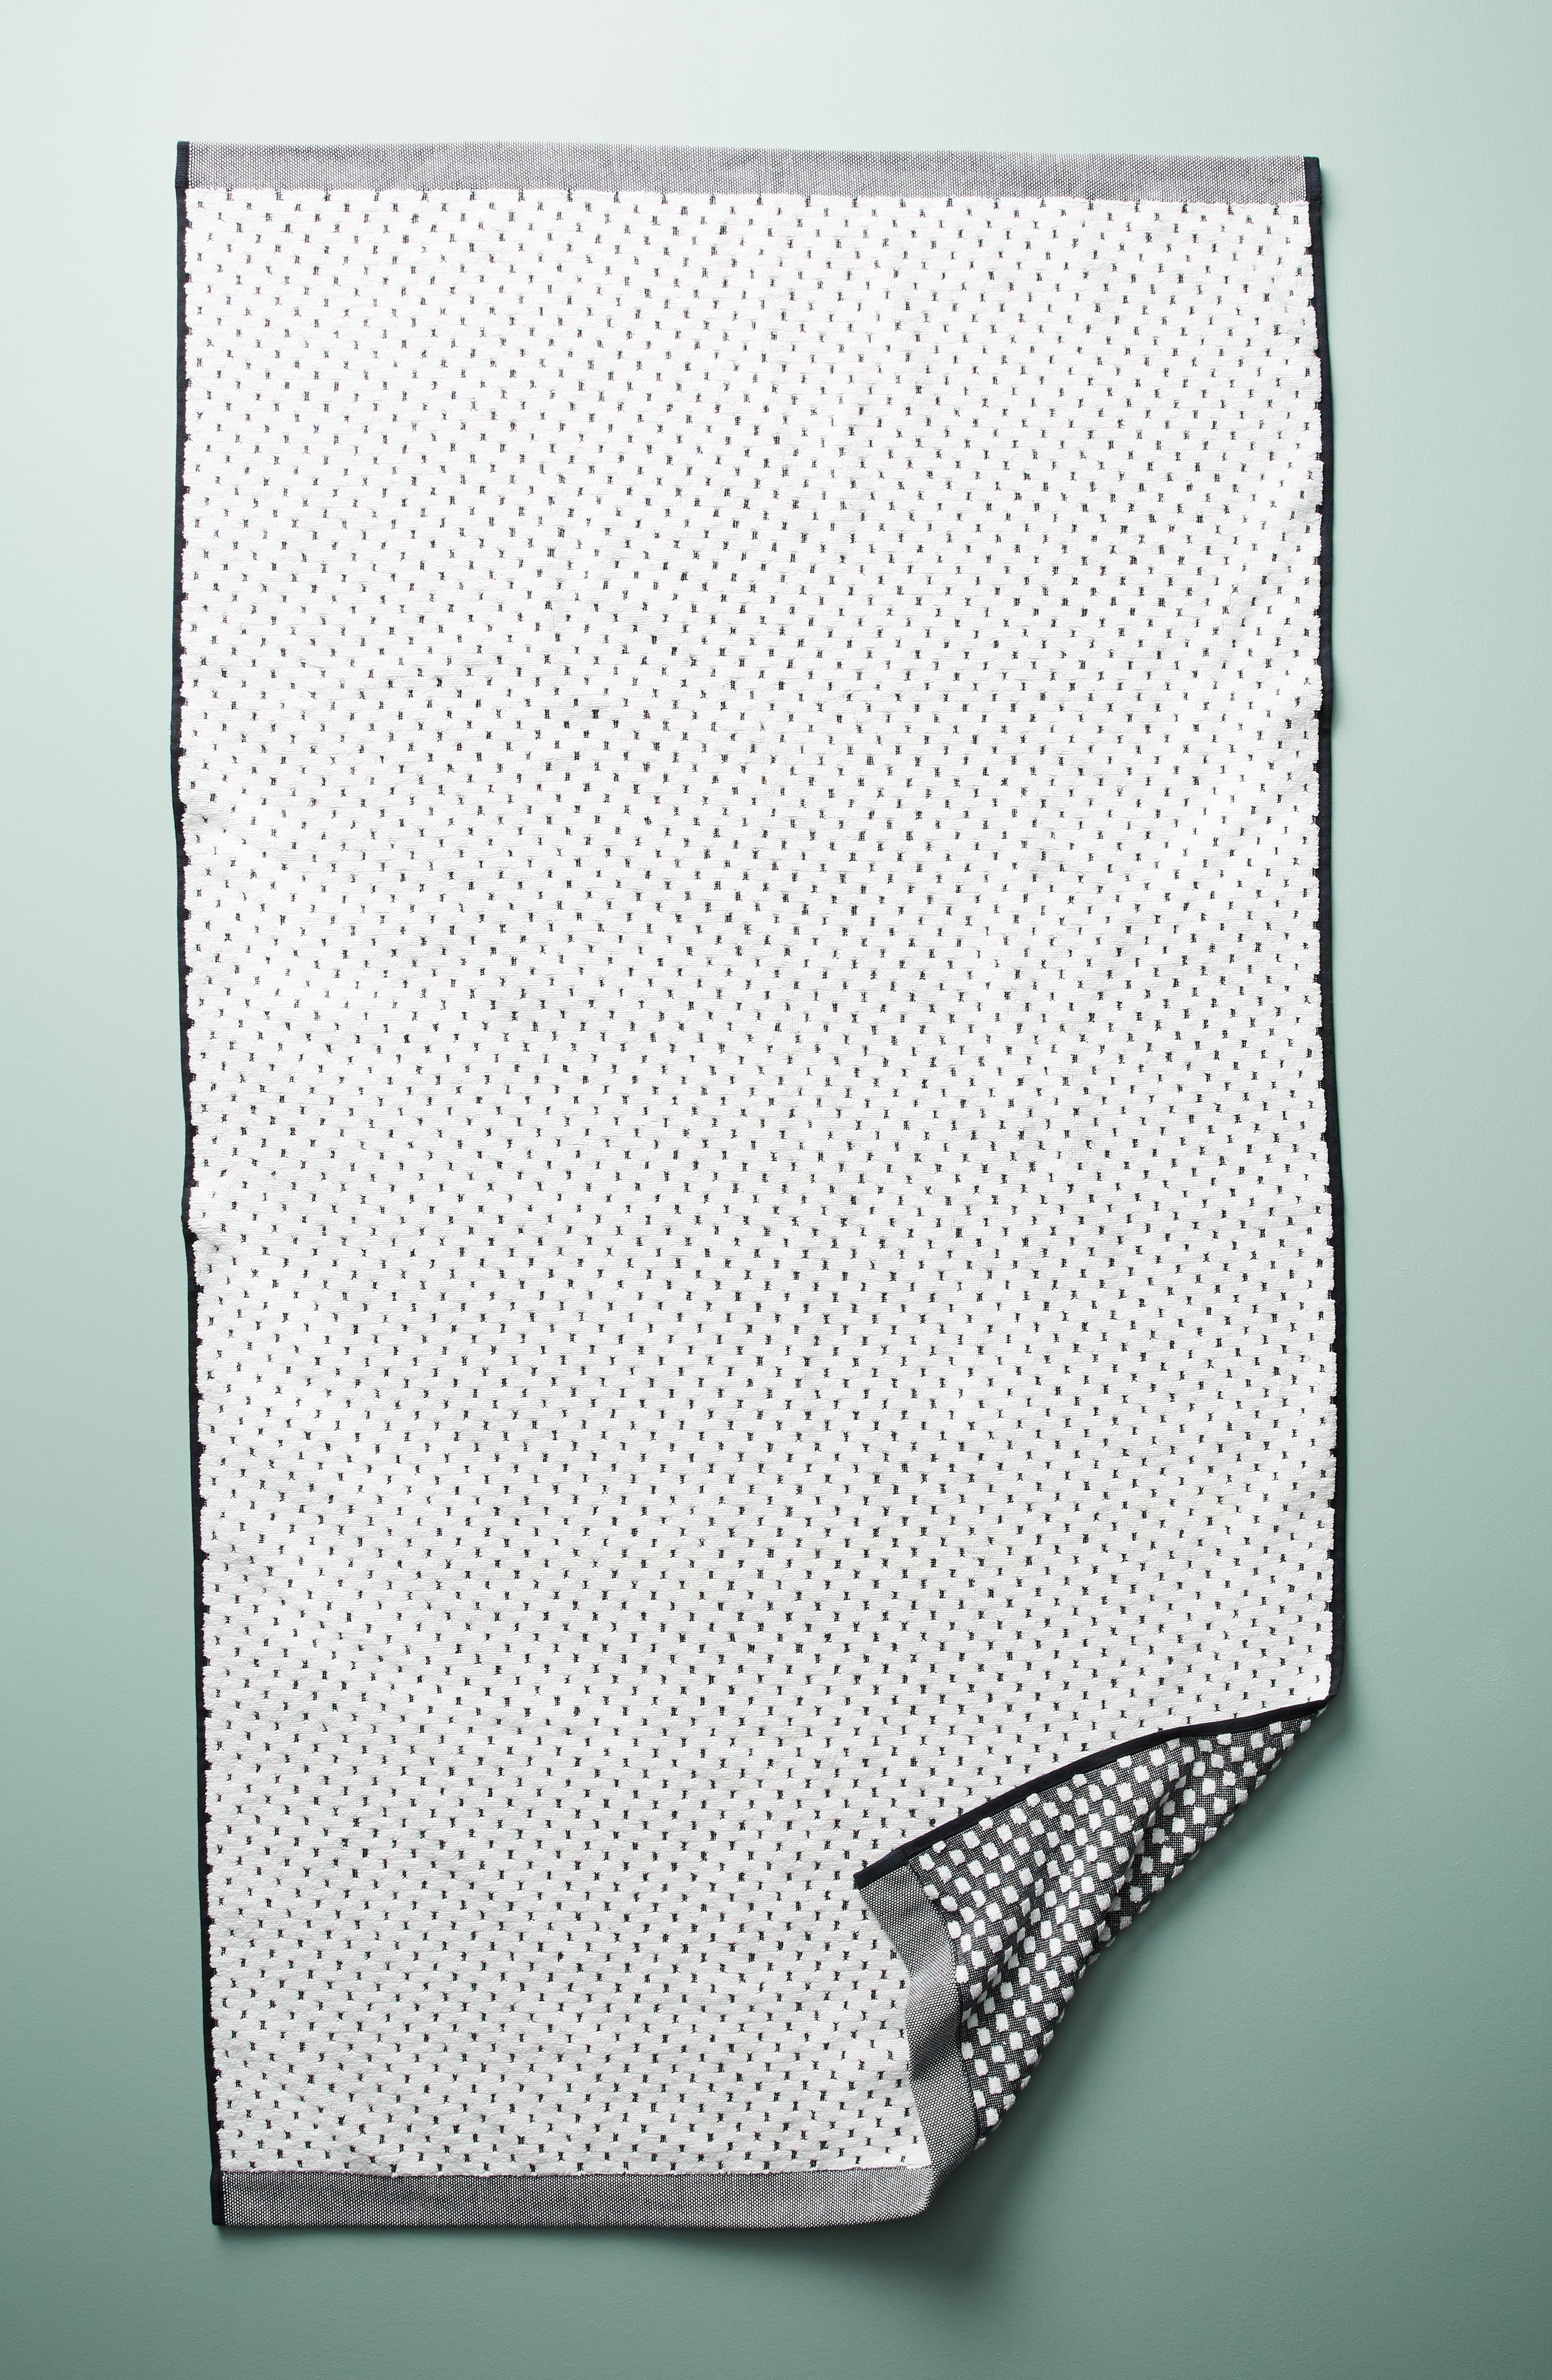 Anthropologie Dot Jacquard Bath Towel